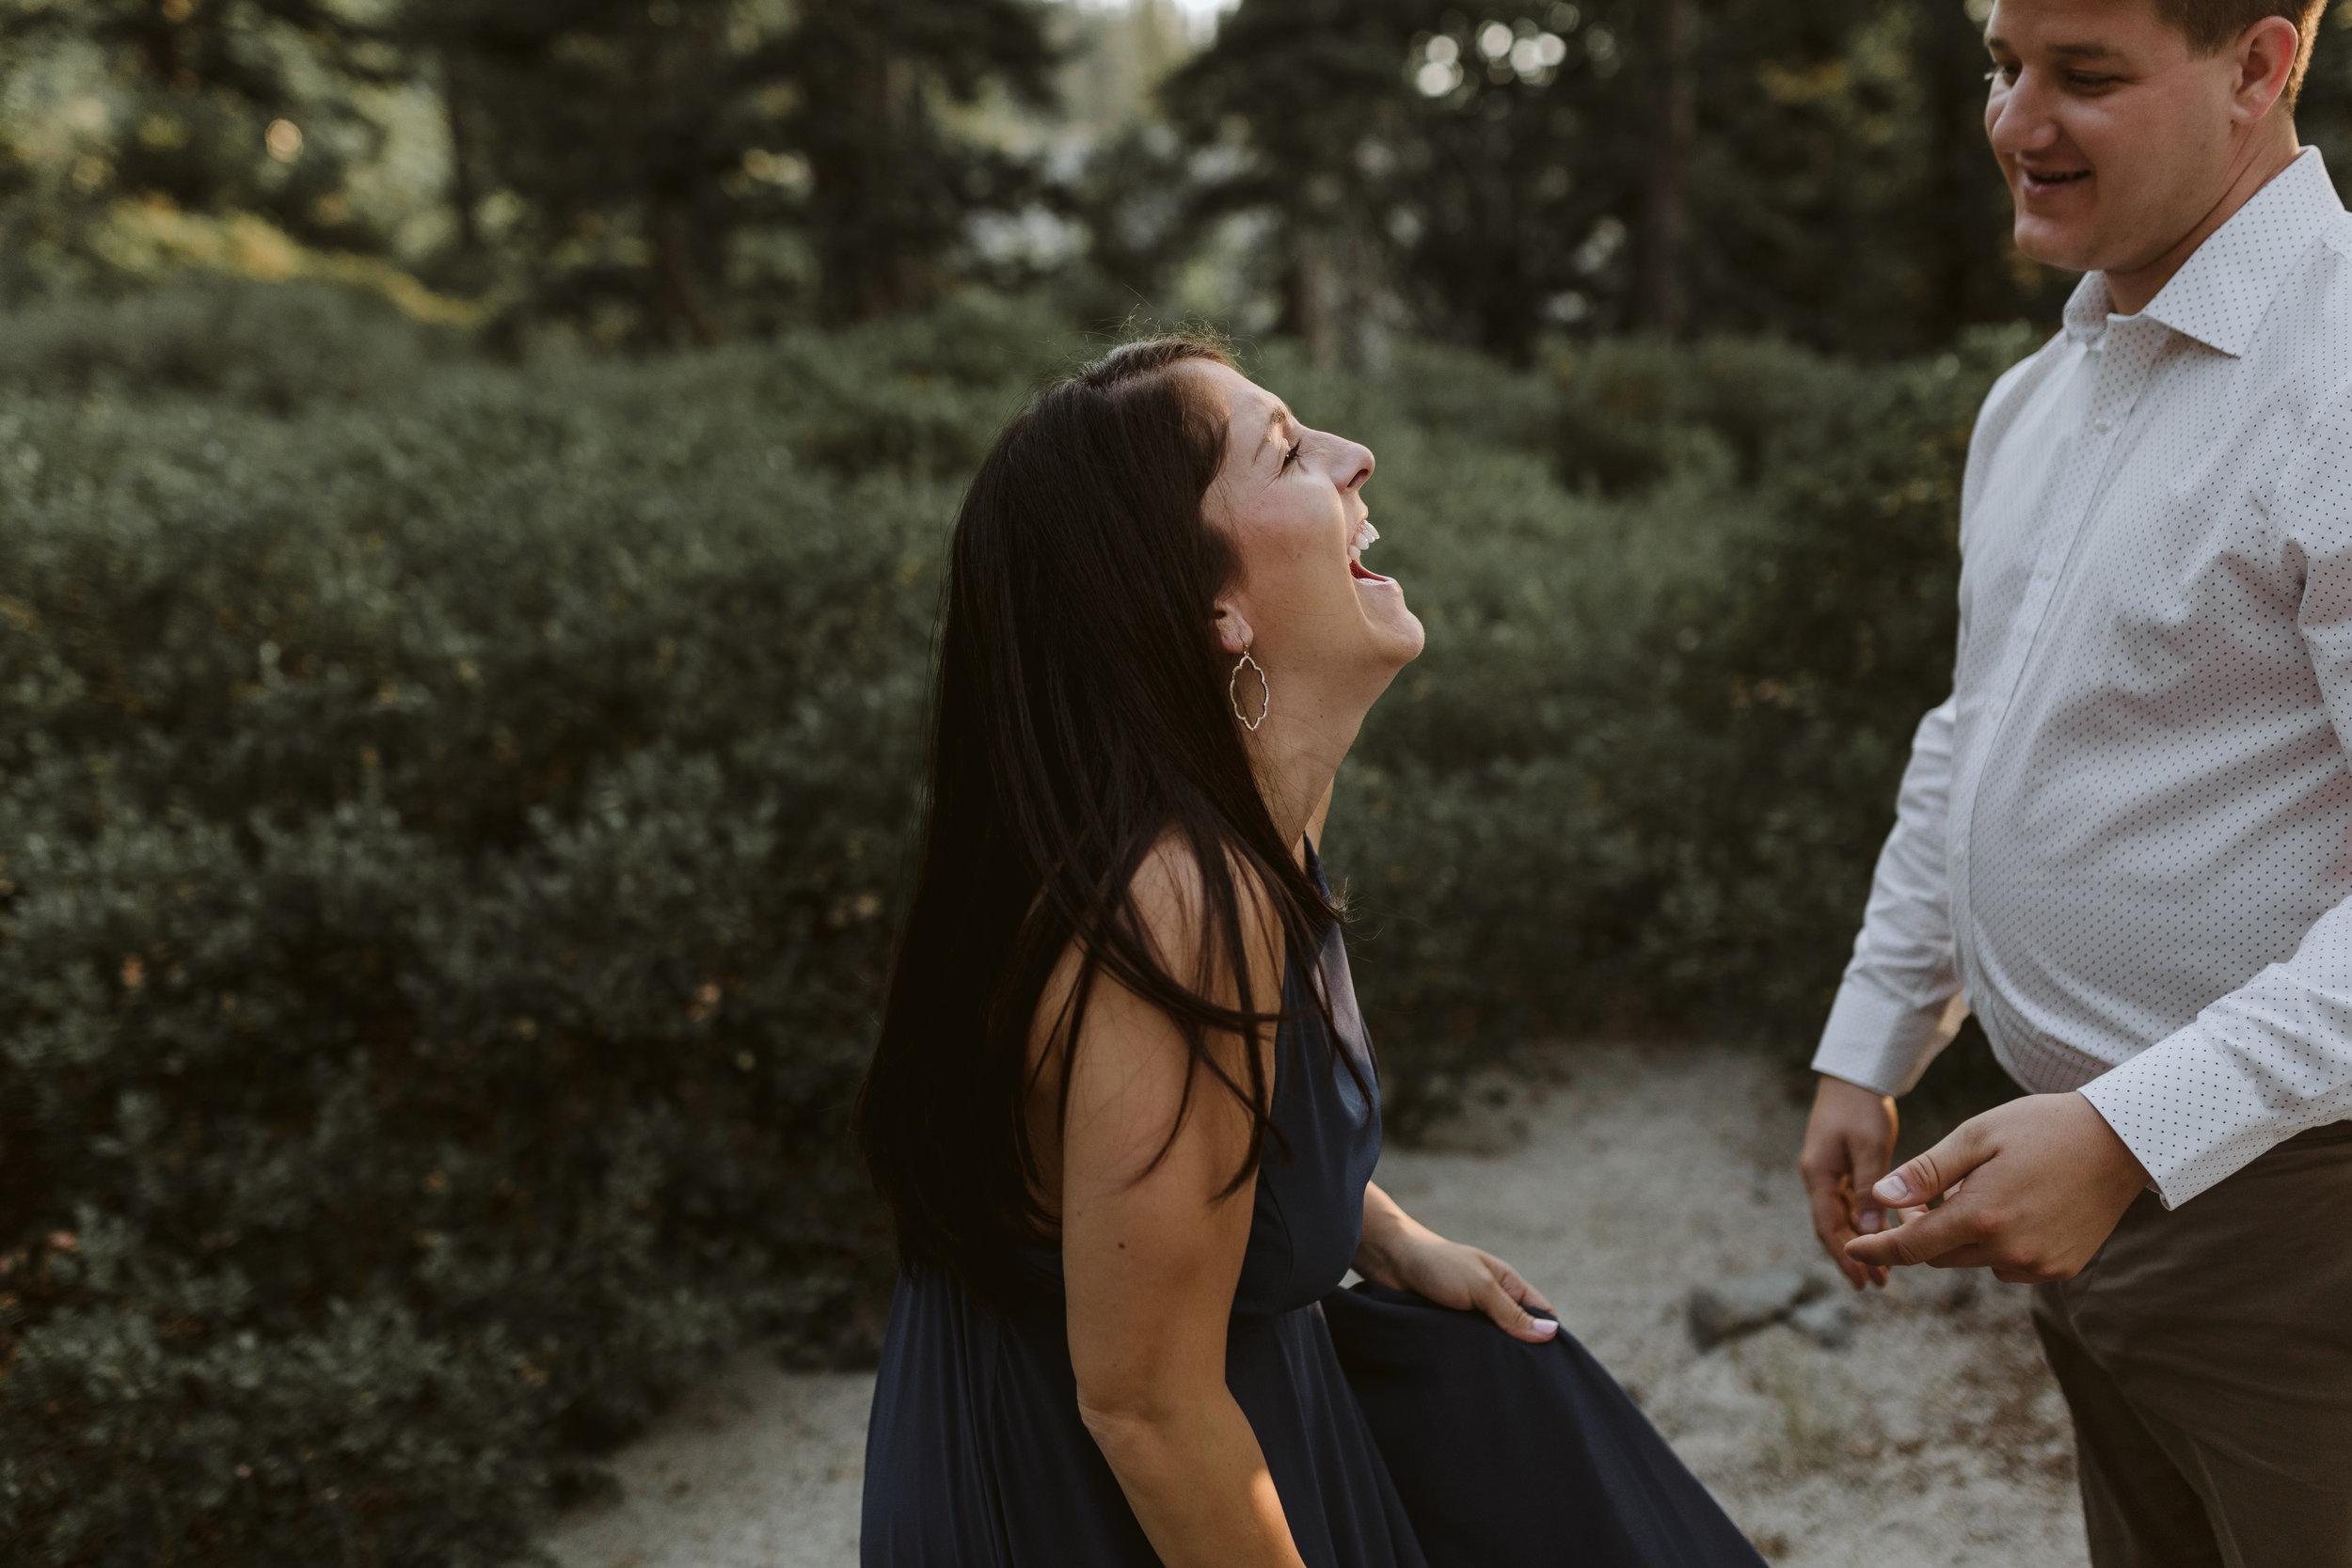 nicole-daacke-photography-lake-tahoe-sunrise-summer-adventure-engagement-photos-nevada-wedding-elopement-photographer-golden-emerald-bay-light-pine-trees-summer-vibe-fun-carefree-authentic-love-40.jpg